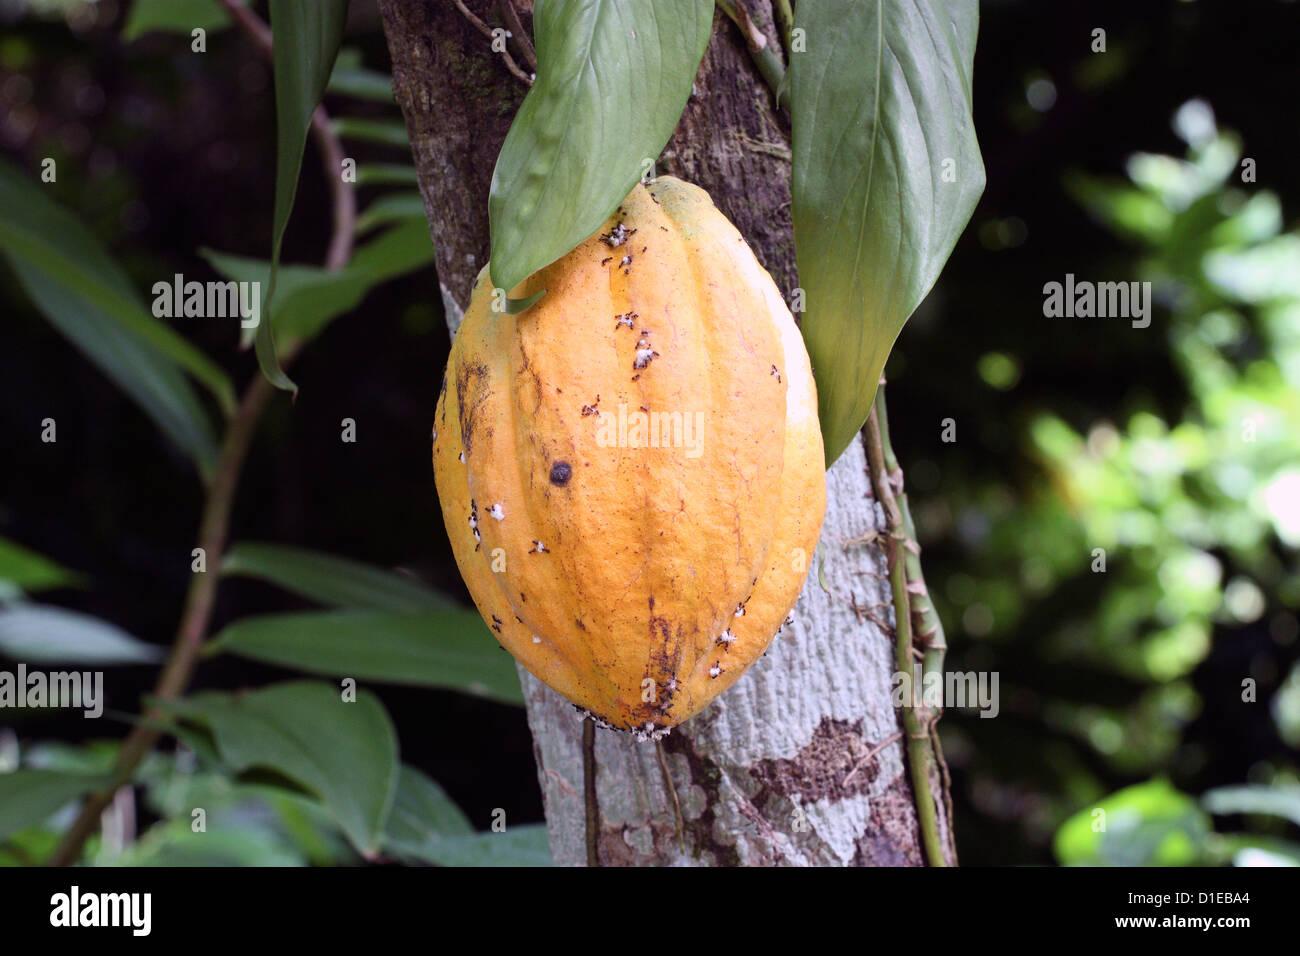 Grenada. Close-up of growing Cocoa bean pod. - Stock Image